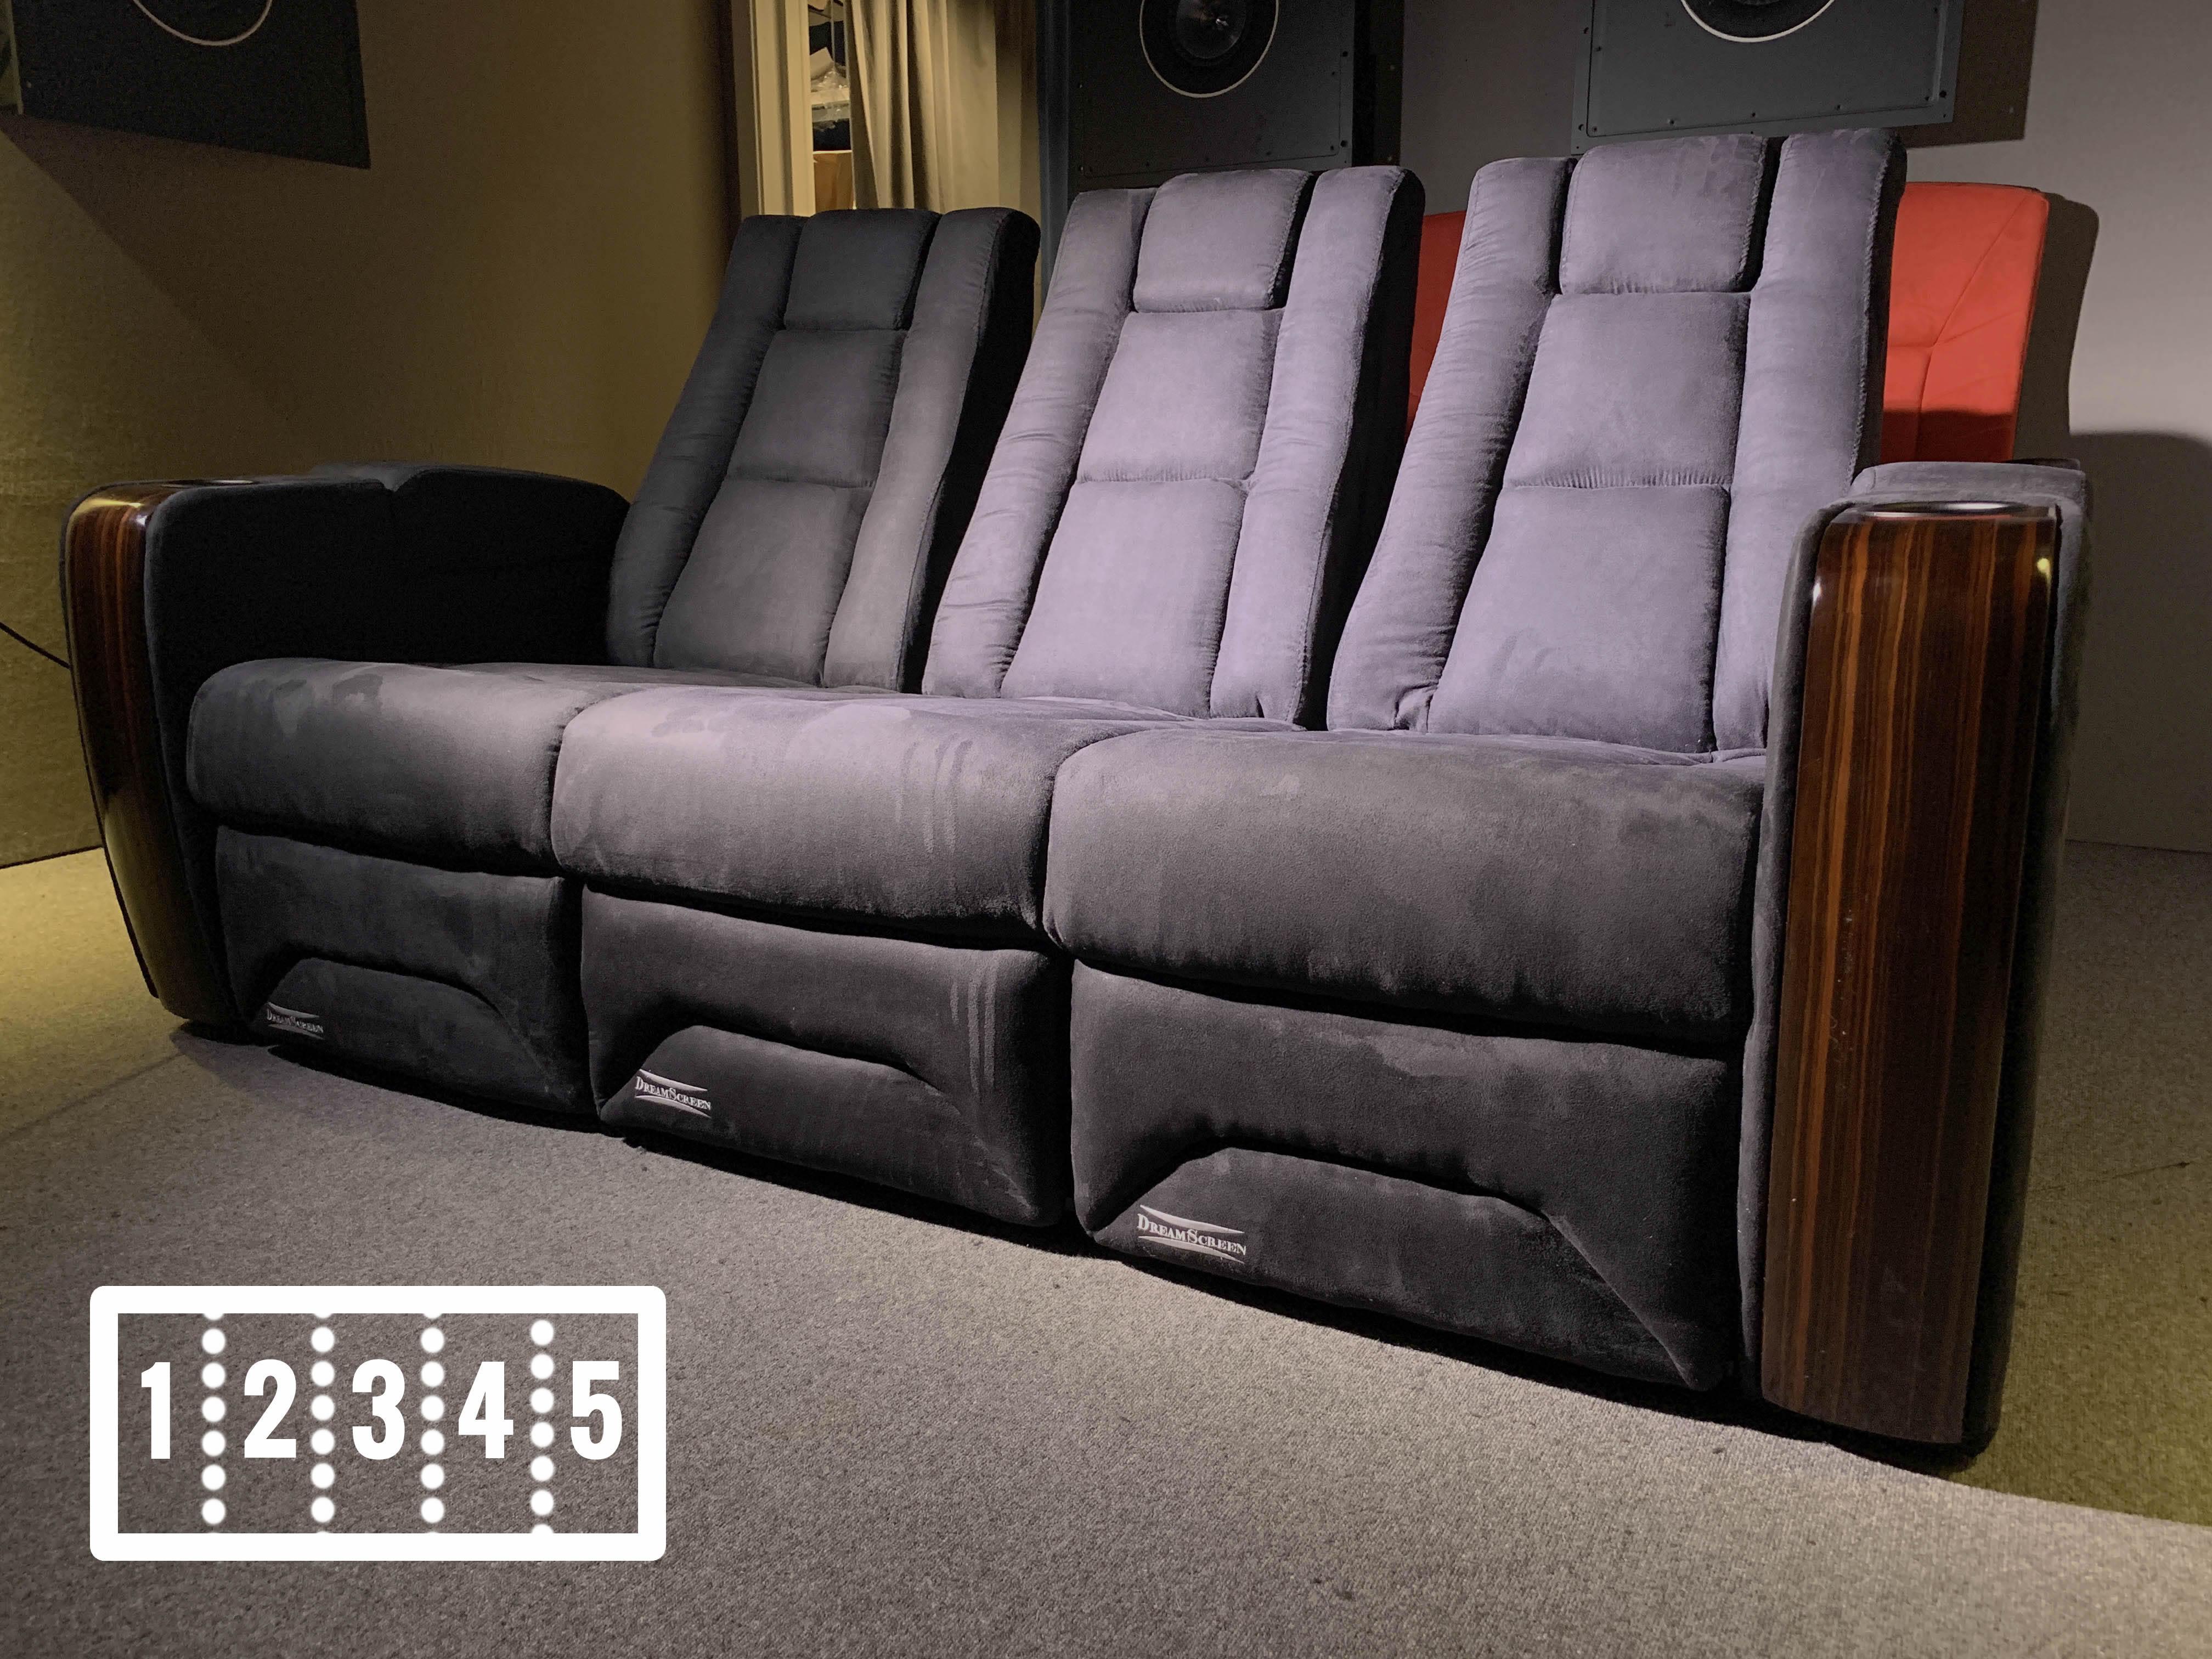 DreamScreen CineSeat ProMotor v4 Motorisert Recliner 5-seter TextileShield Mikrofiber Sort LOVESEAT